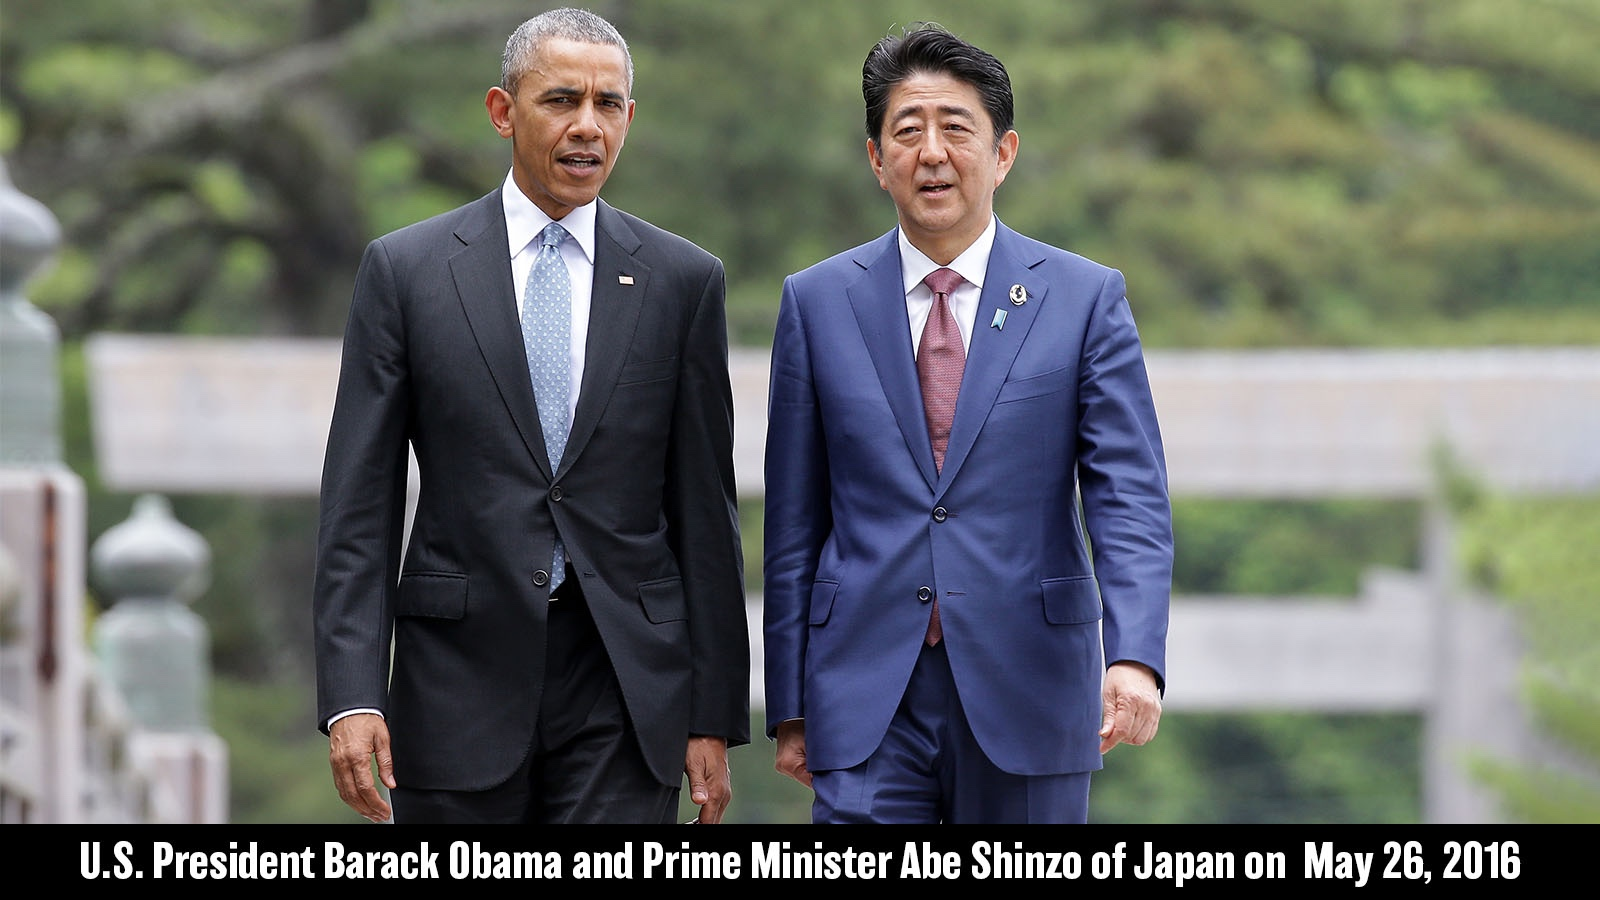 U.S. President Barack Obama and Prime Minister Abe Shinzo of Japan